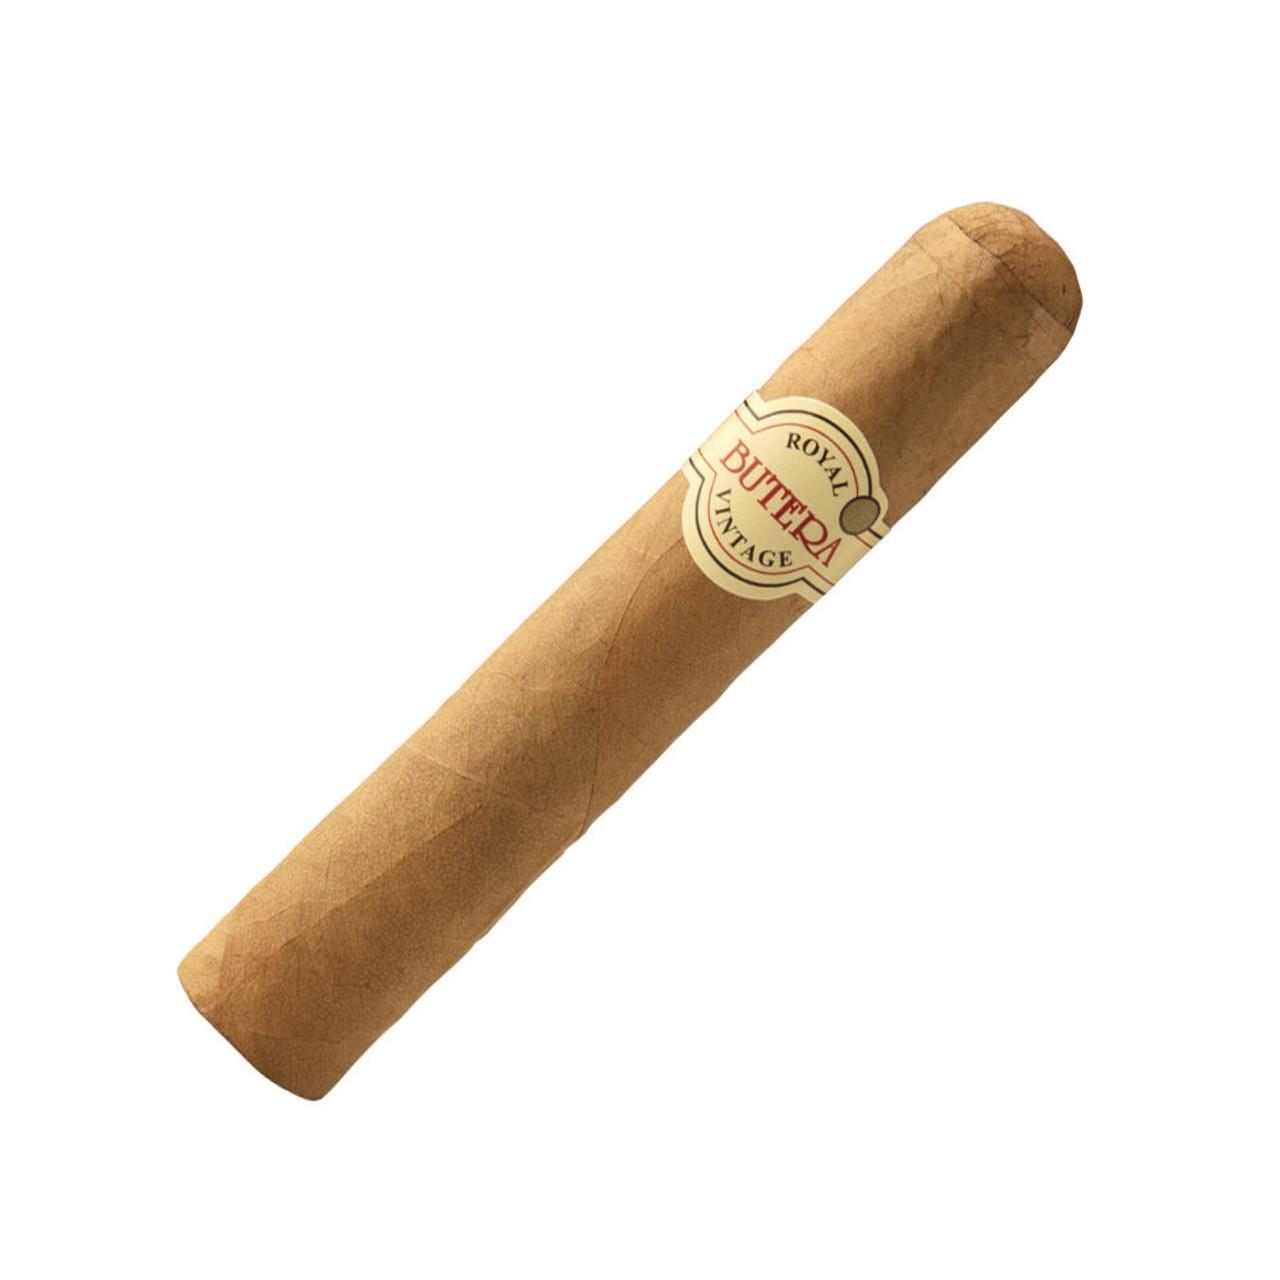 Butera Royal Vintage Dorado 652 Cigars - 6 x 52 (Box of 20)